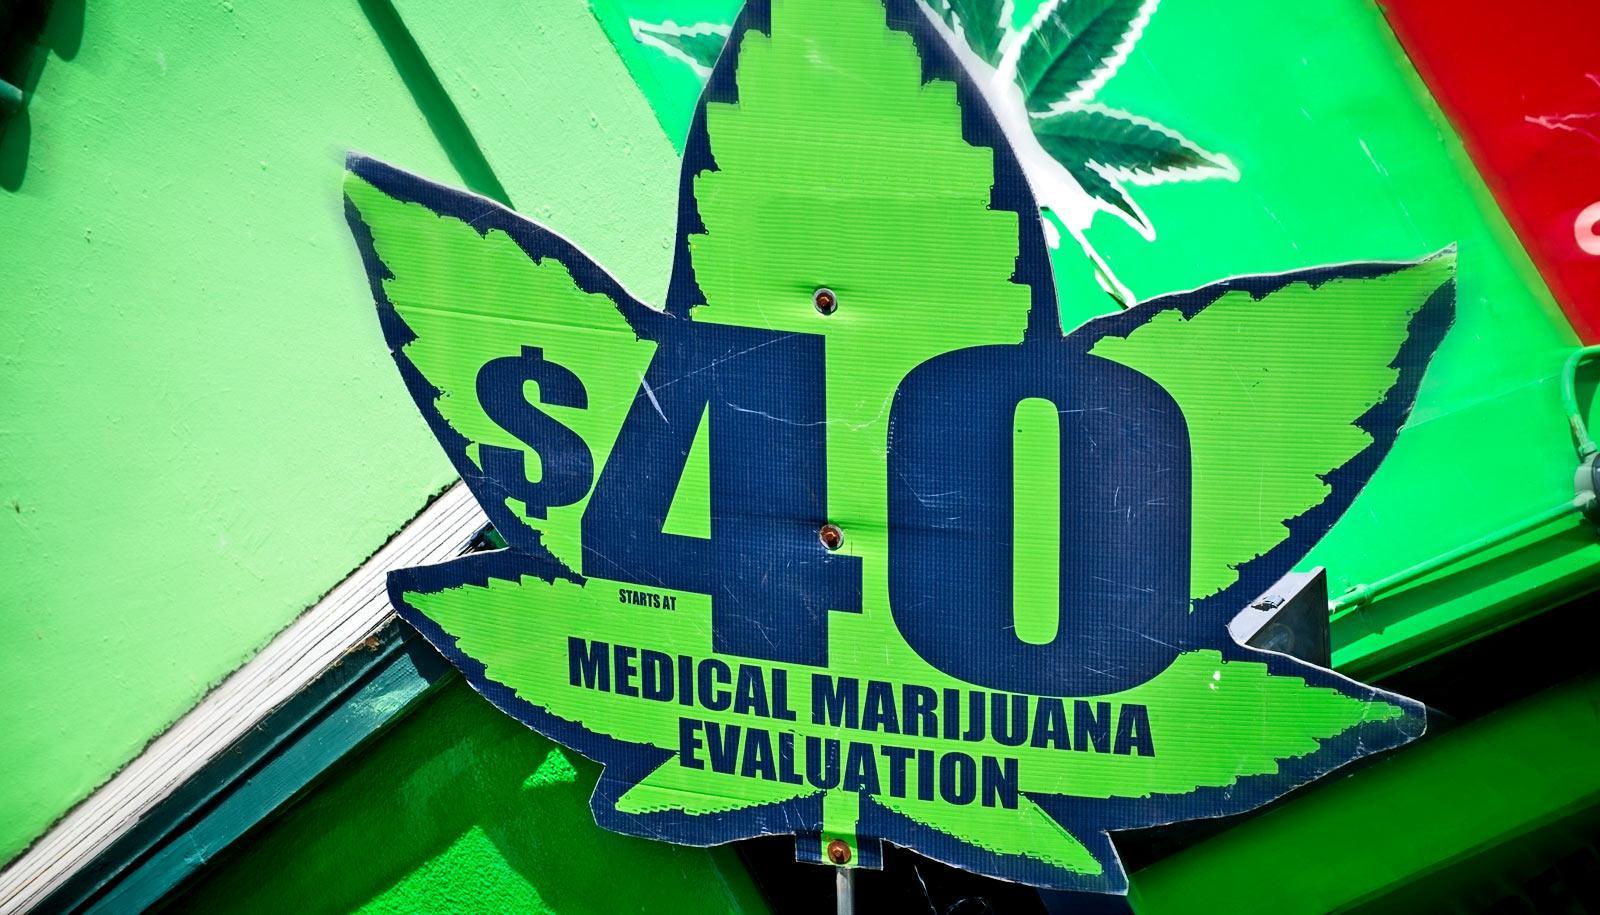 medical marijuana evaluation sign